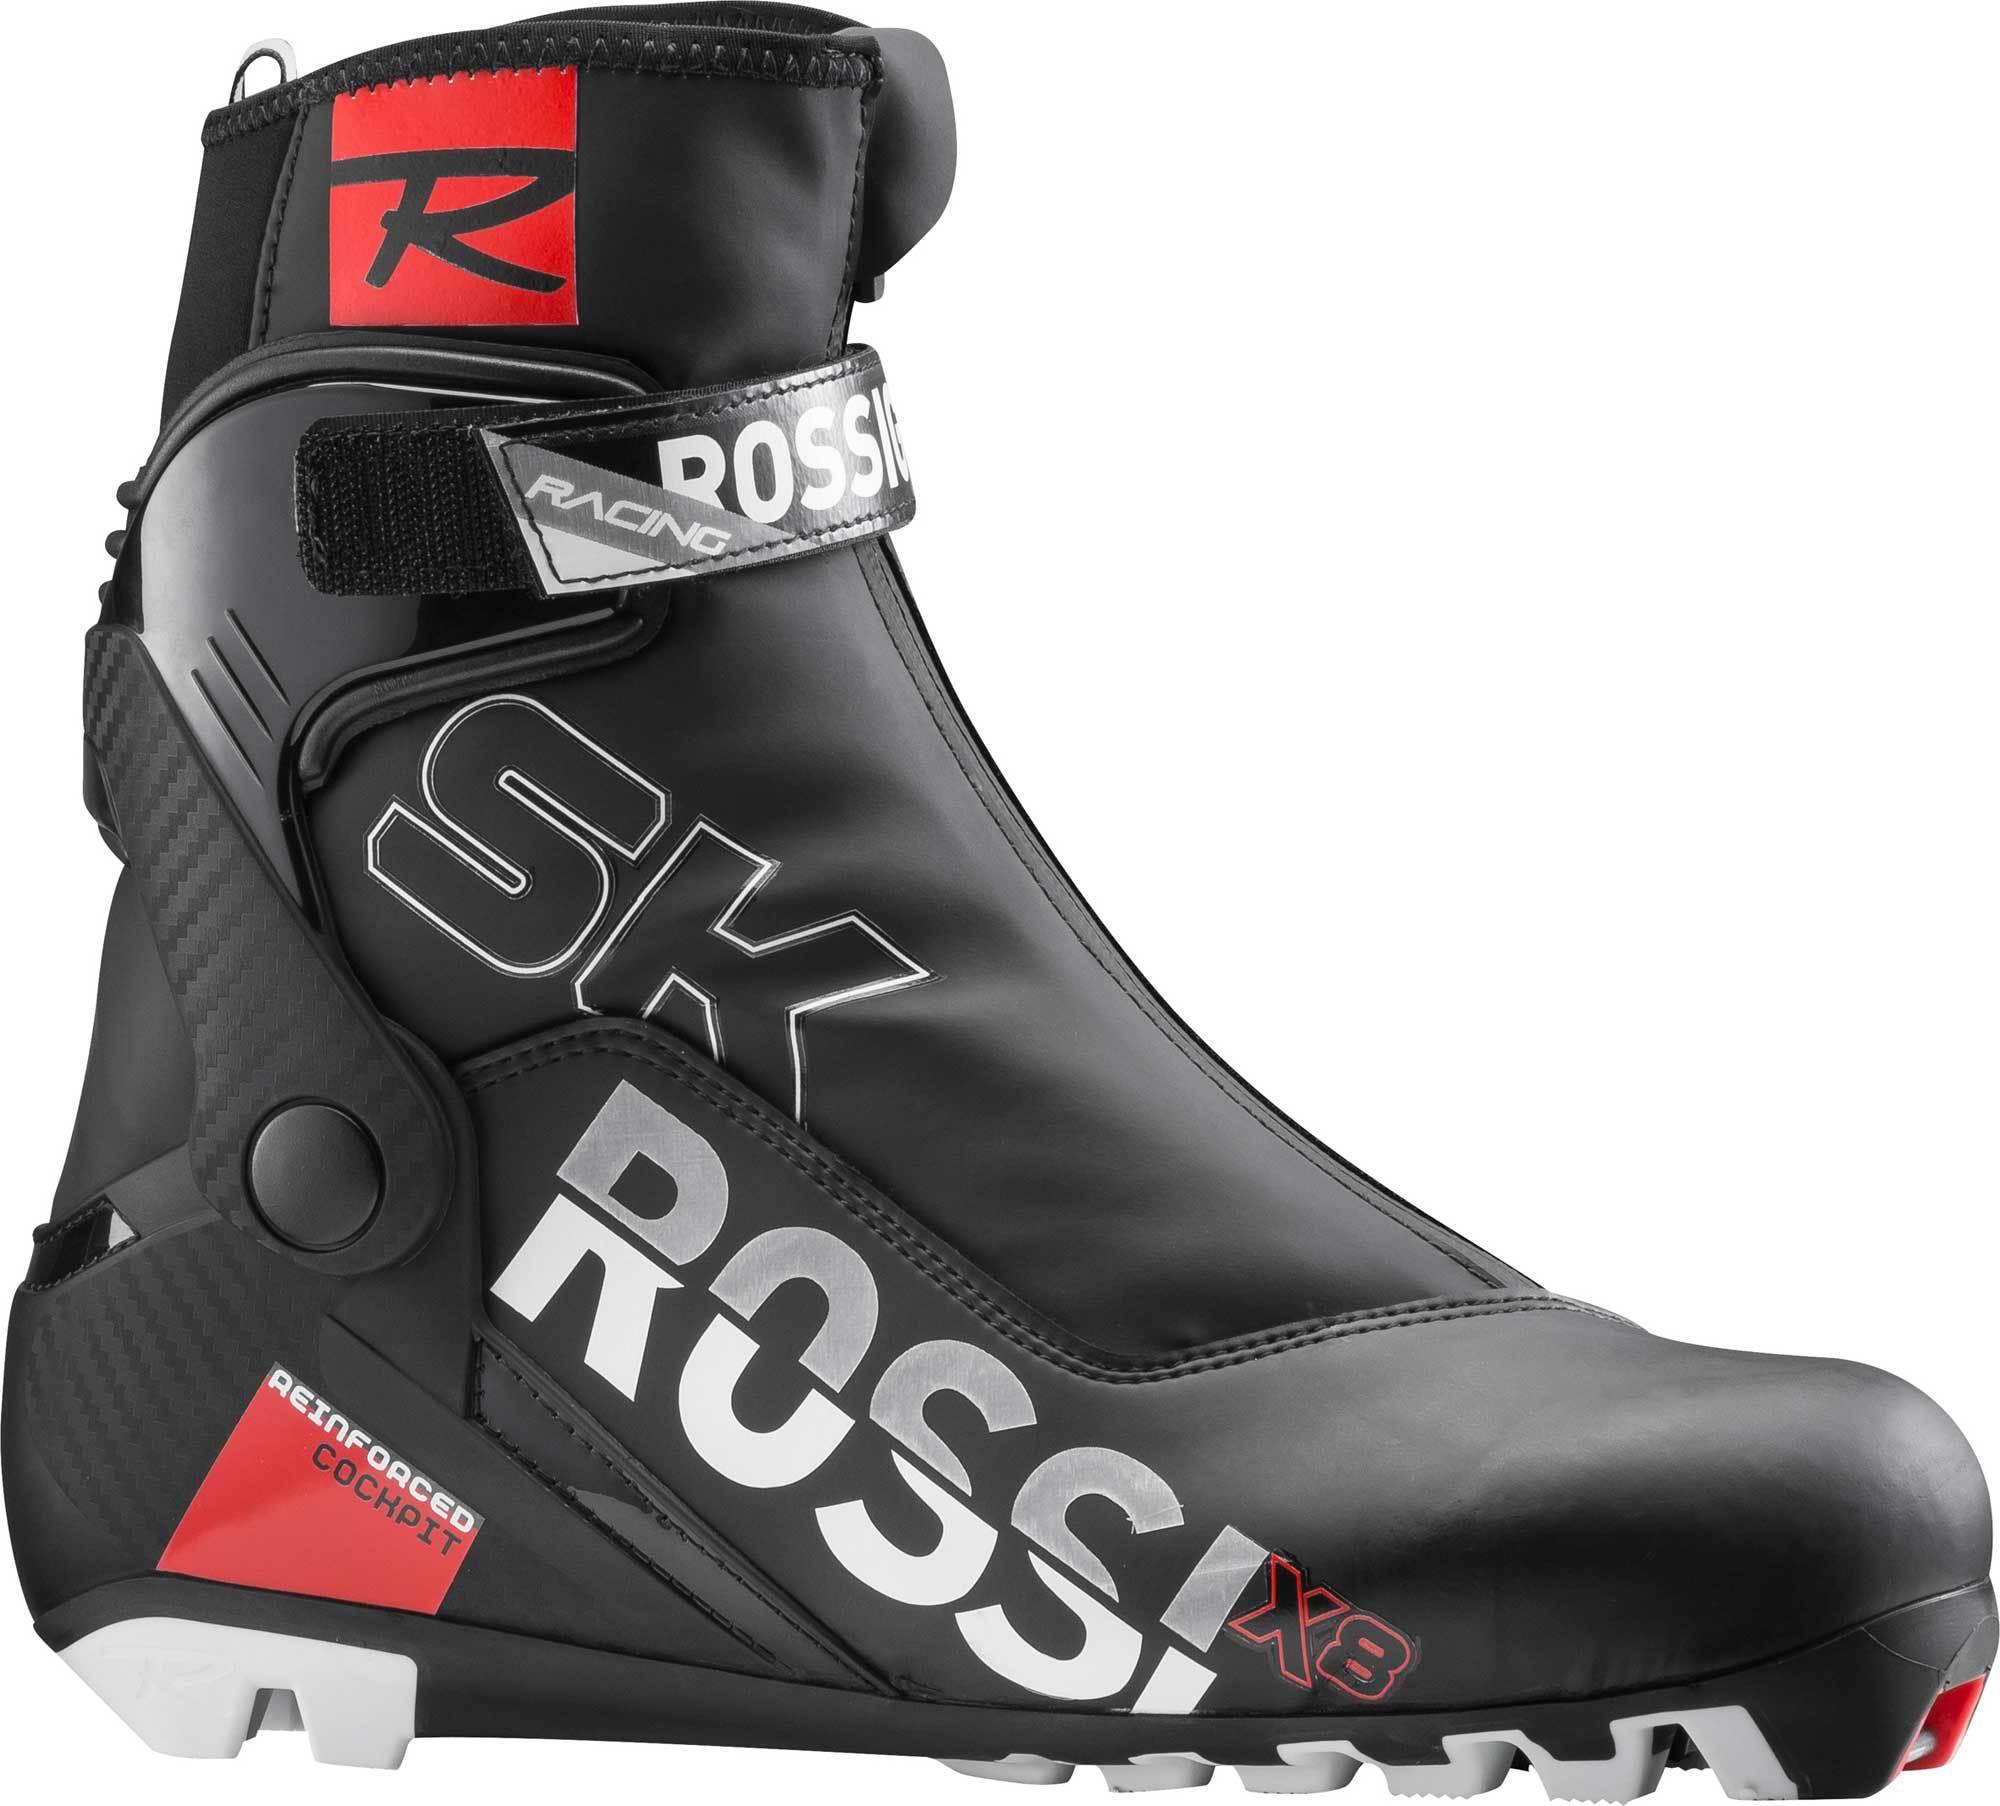 Rossignol X-8 Skate 46